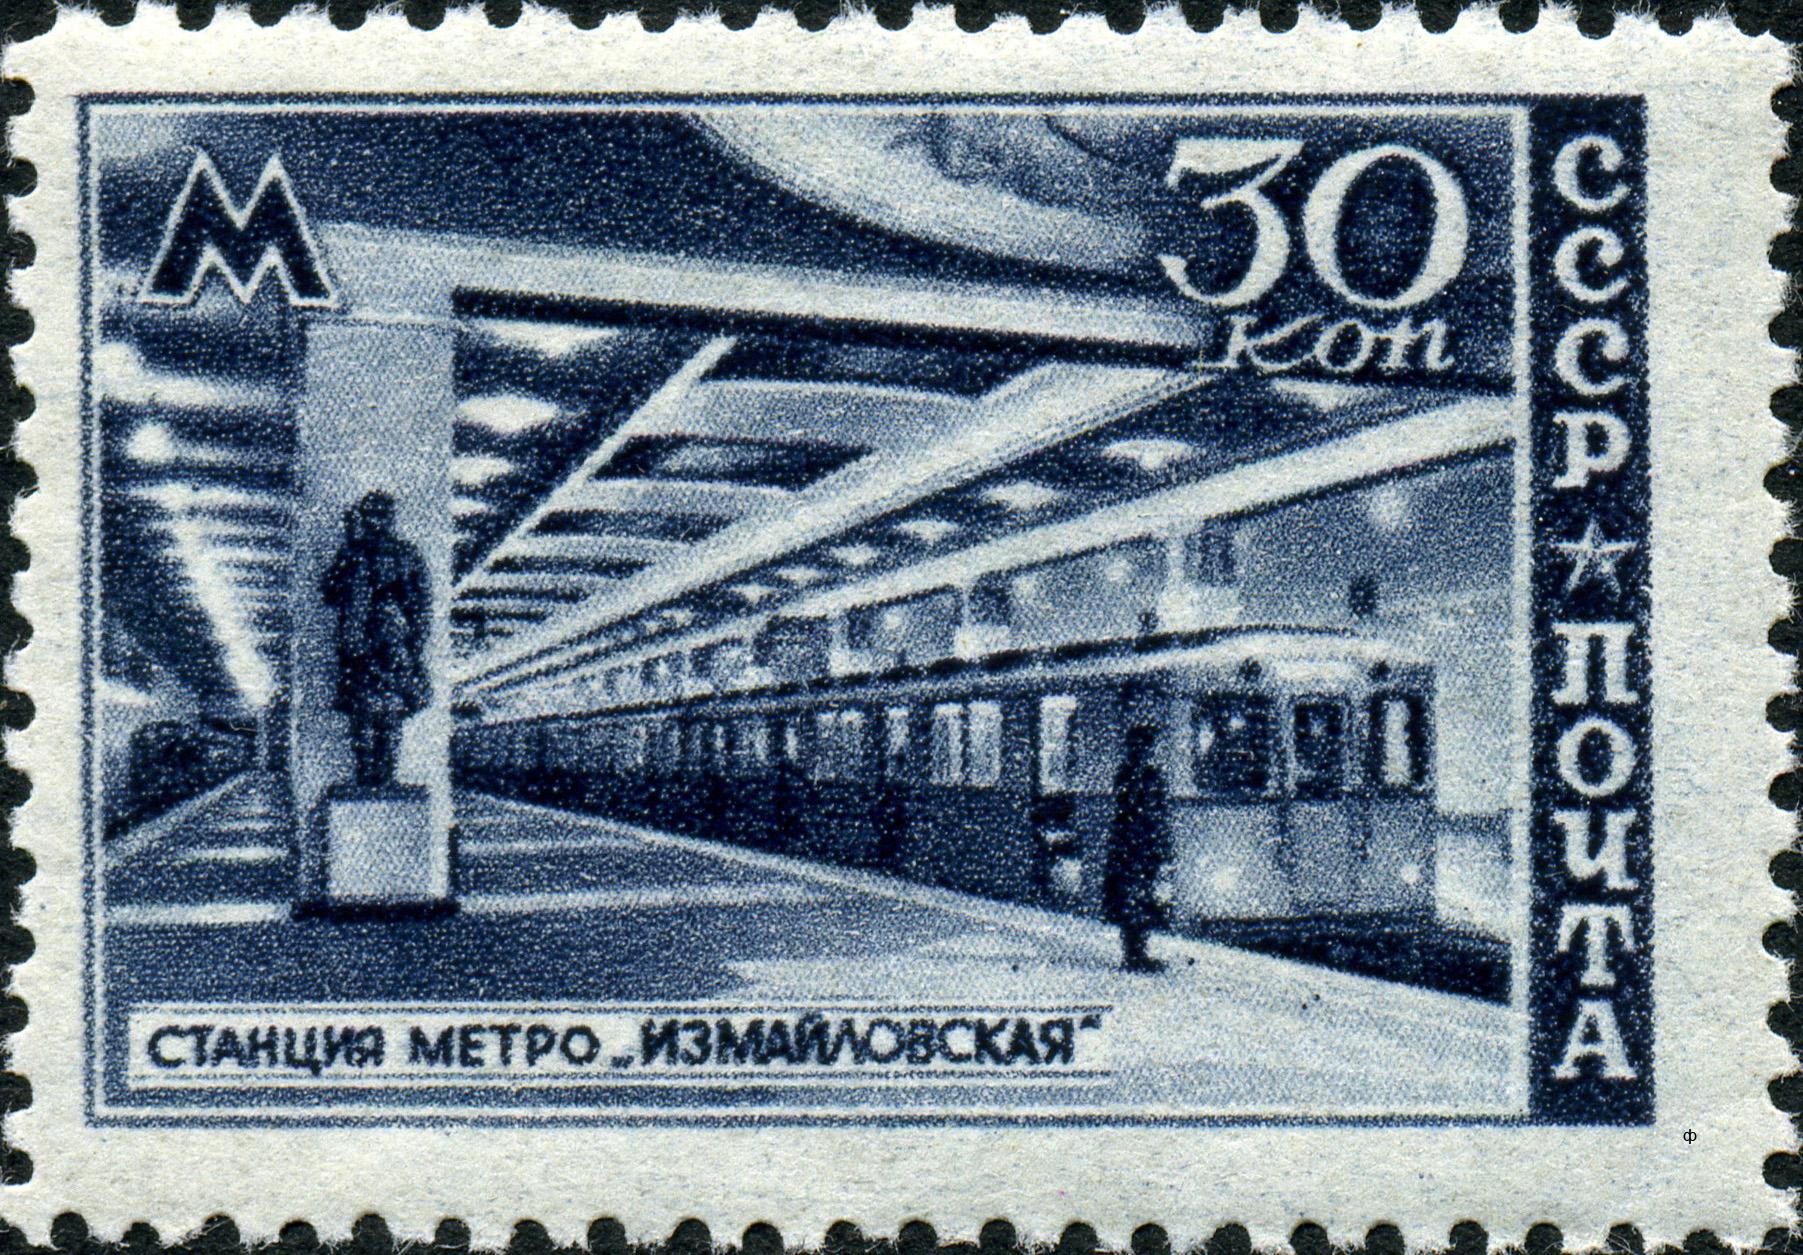 File:Stamp 1947 1148.jpg